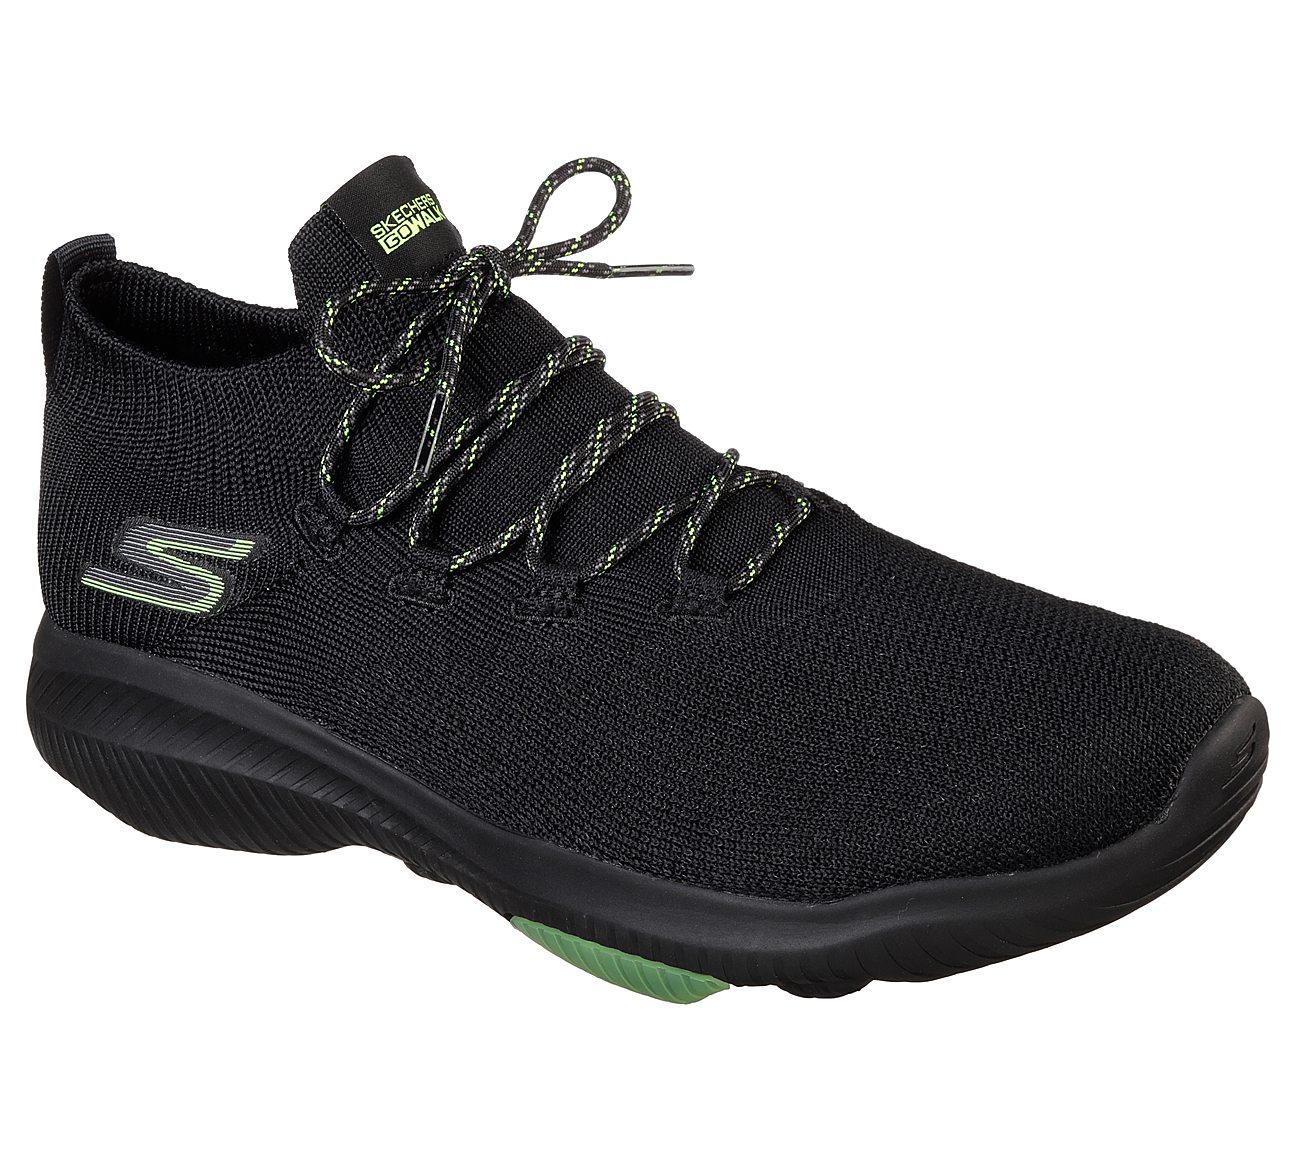 Skechers Shoes 10 GoWalk Go Pillars GogaMat Lightweight Pull On Comfort   1T